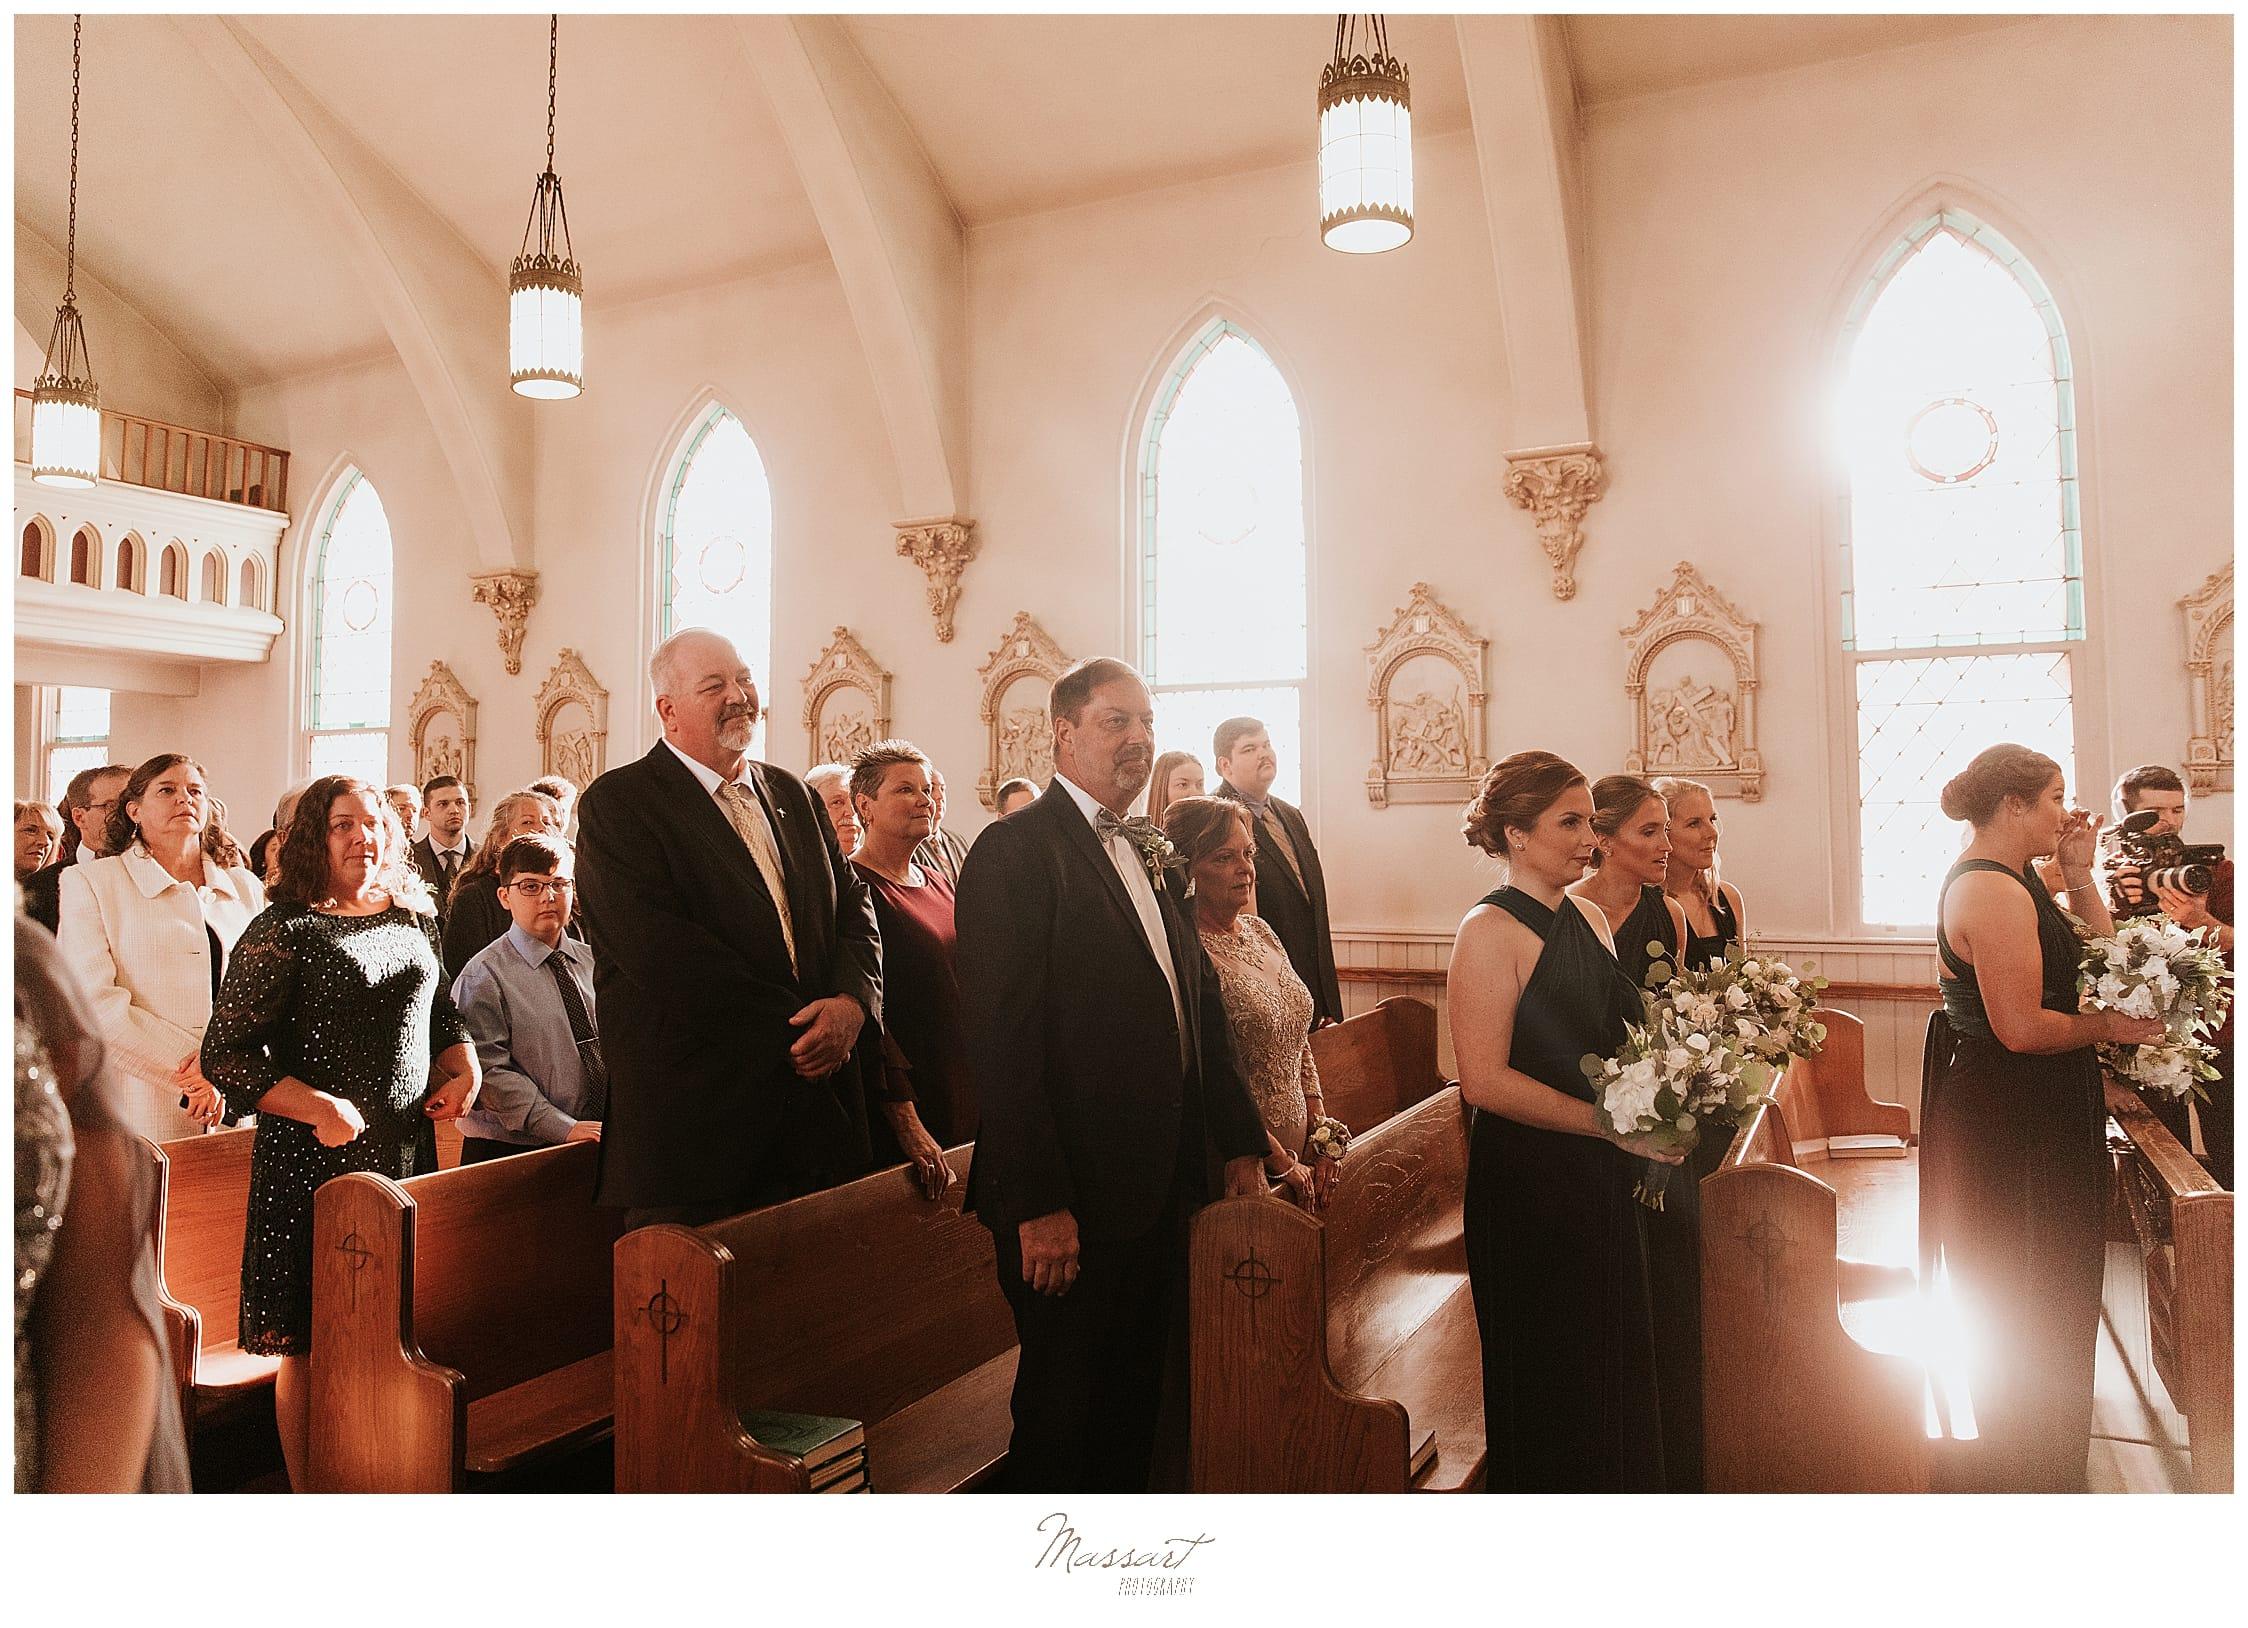 RI, CT, MA wedding photographers Massart Photography capture traditional church wedding